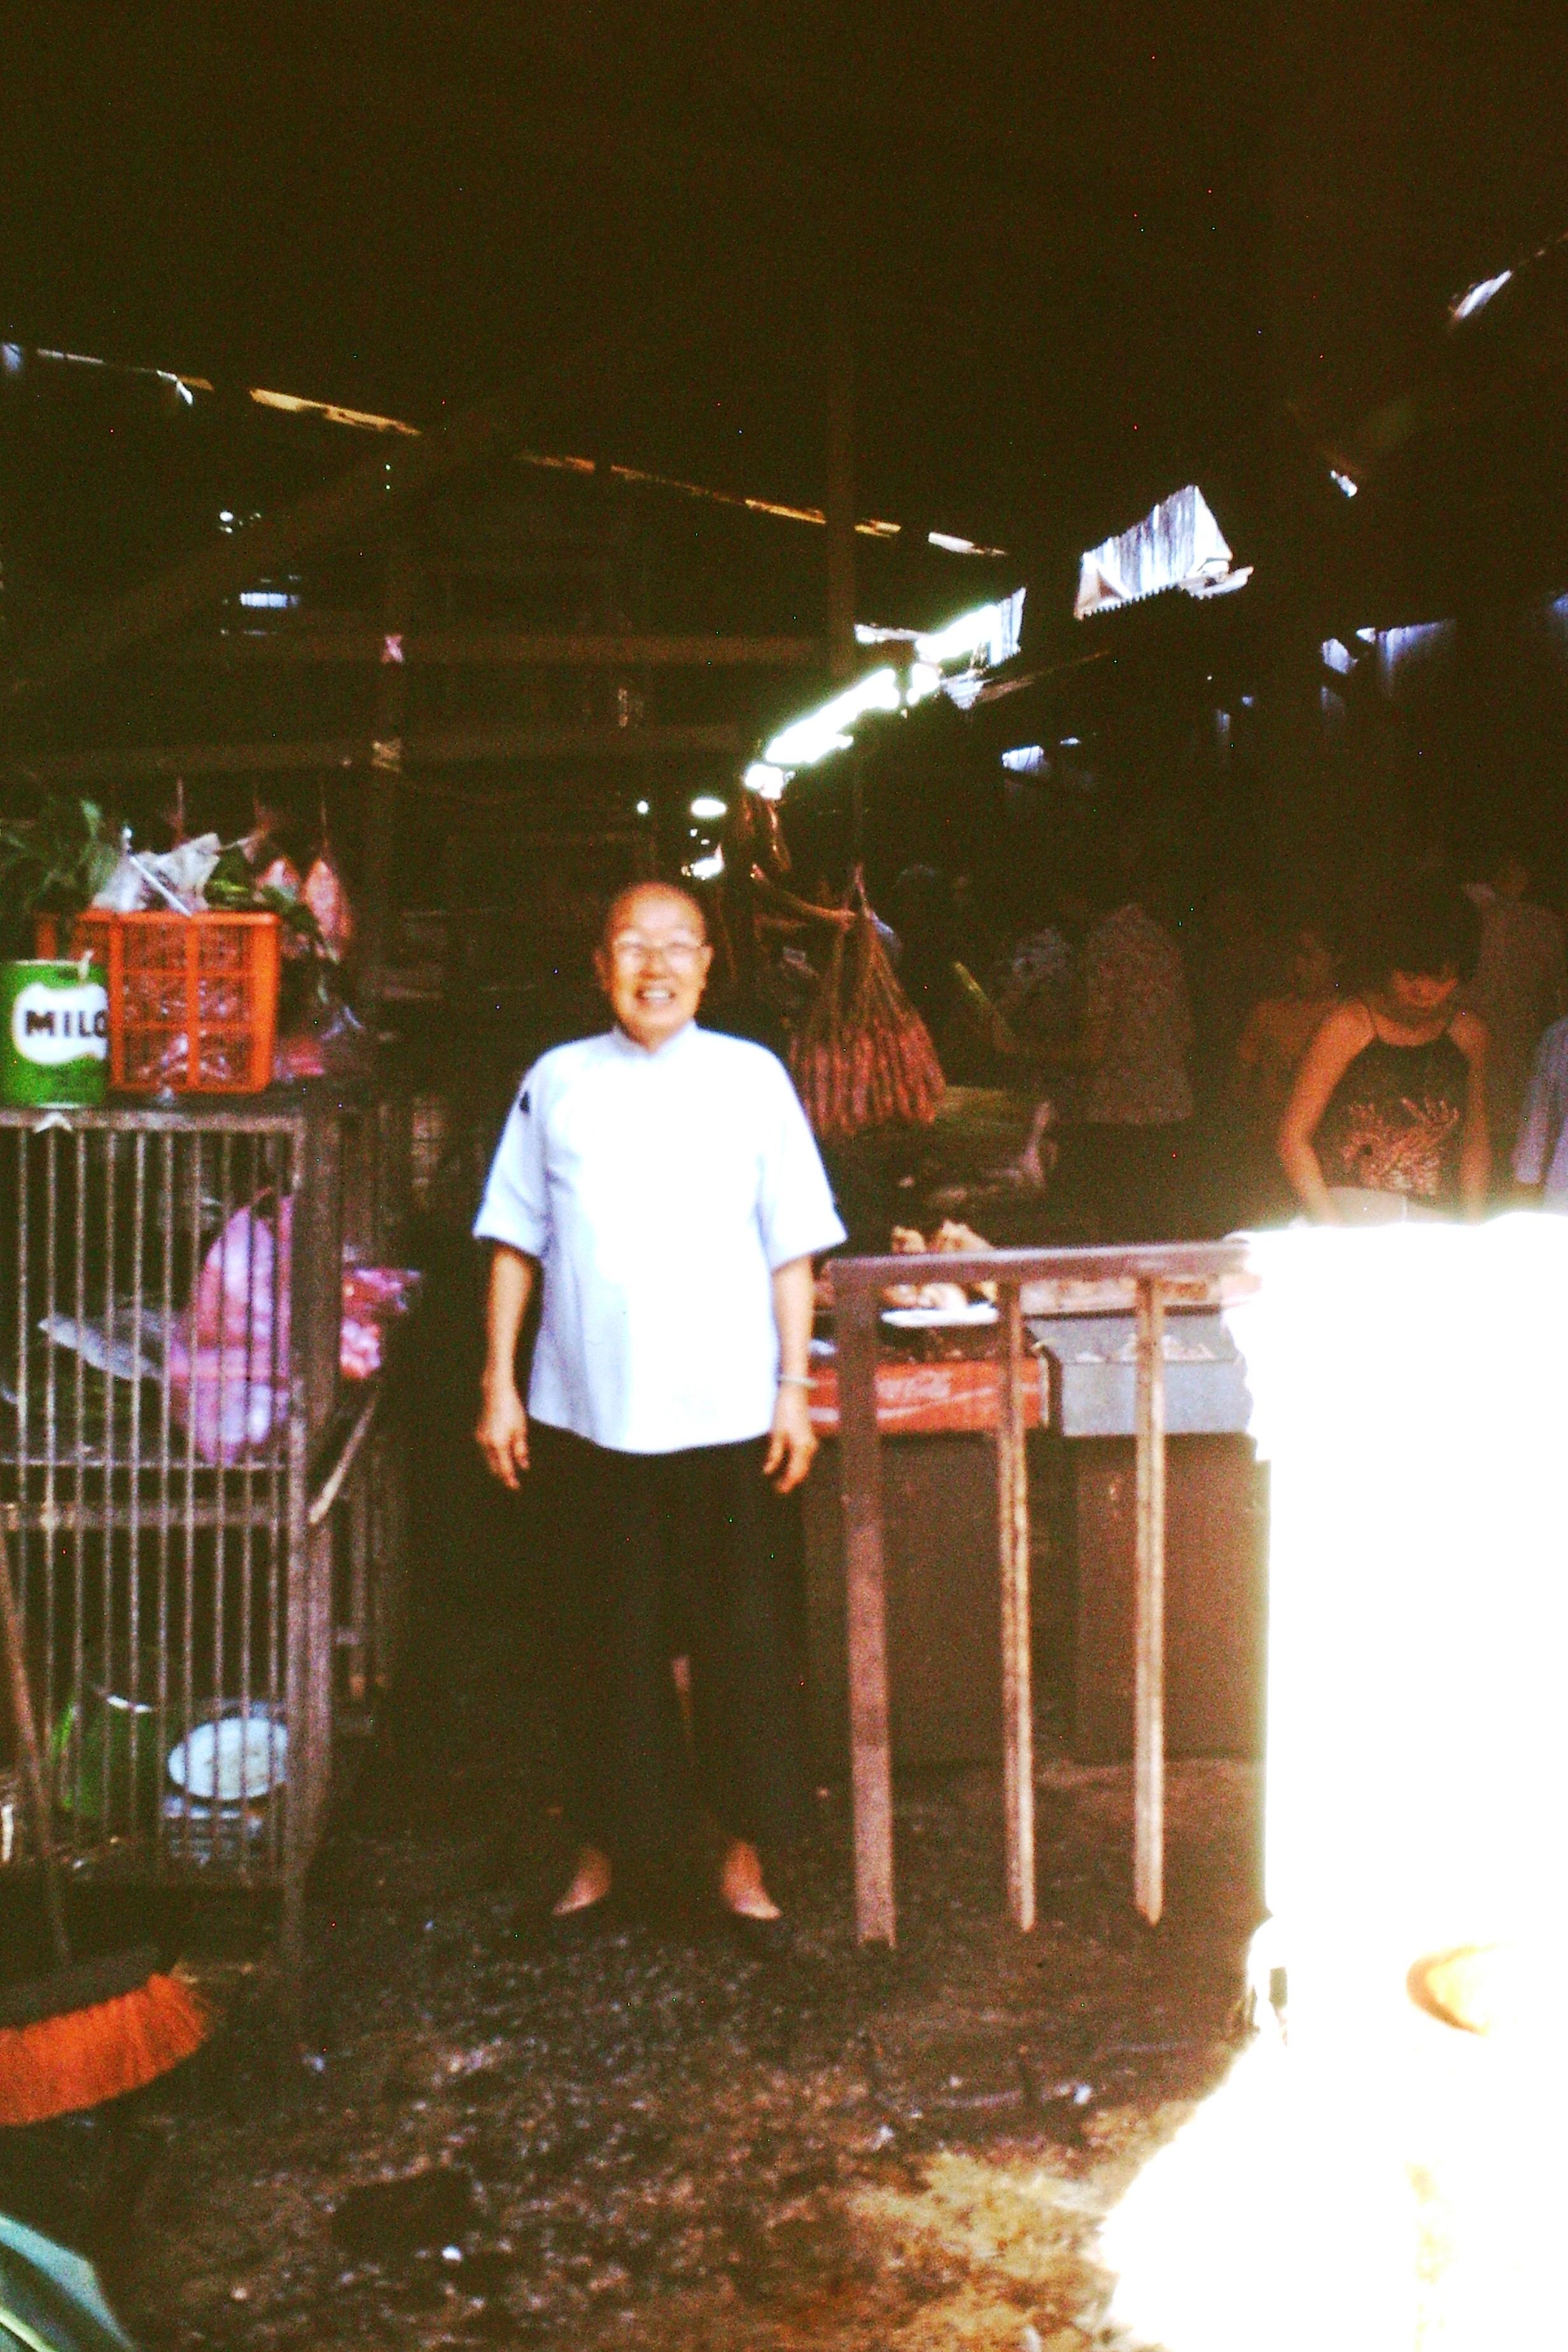 Ah Loke at the market